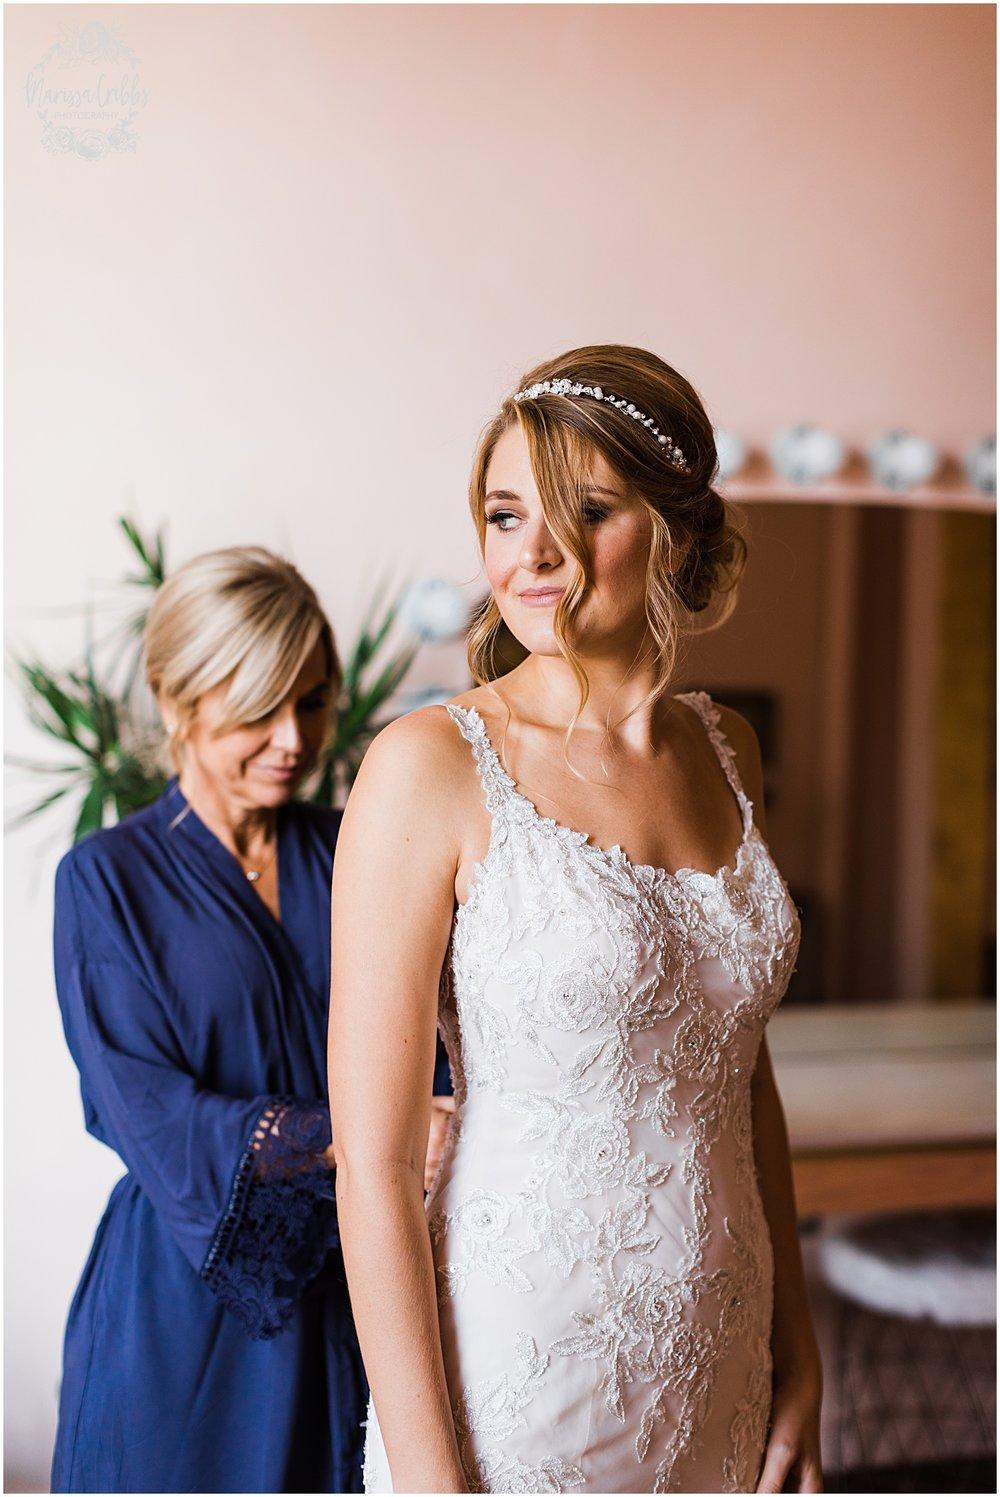 BAUER WEDDING | KELSEA & JUSTIN | MARISSA CRIBBS PHOTOGRAPHY_6493.jpg